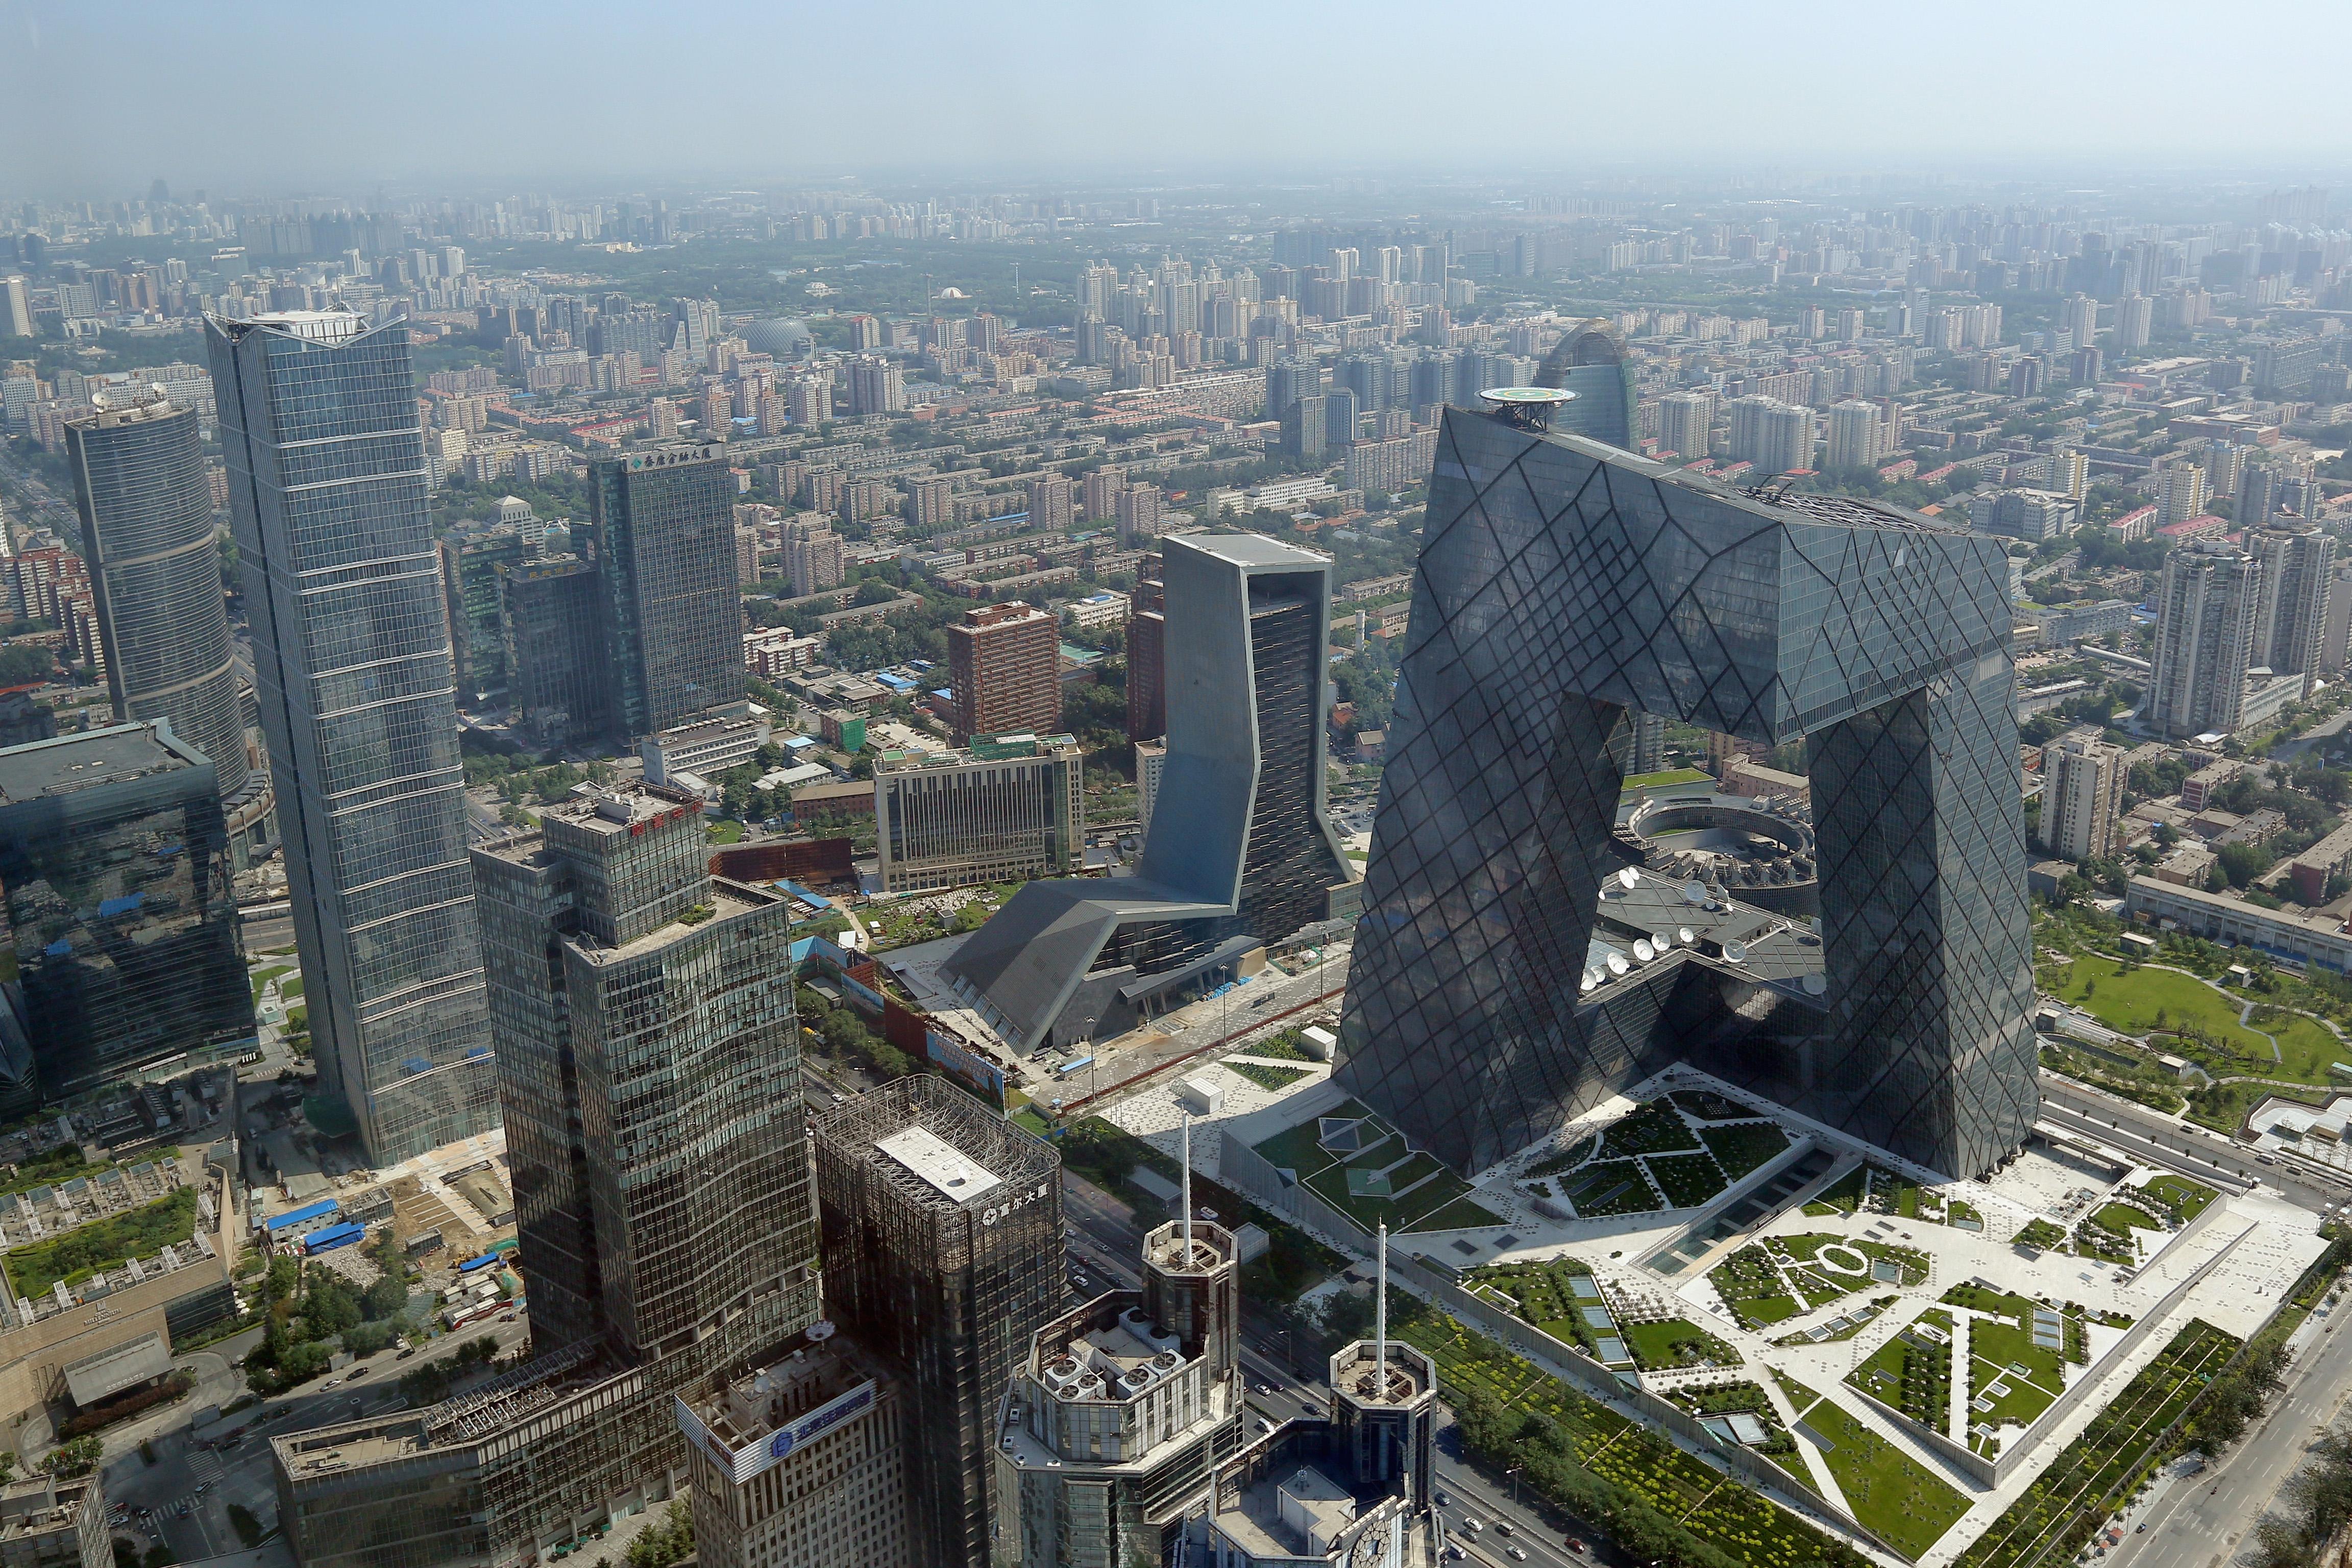 50 reasons why Shanghai is the world's greatest city | CNN Travel